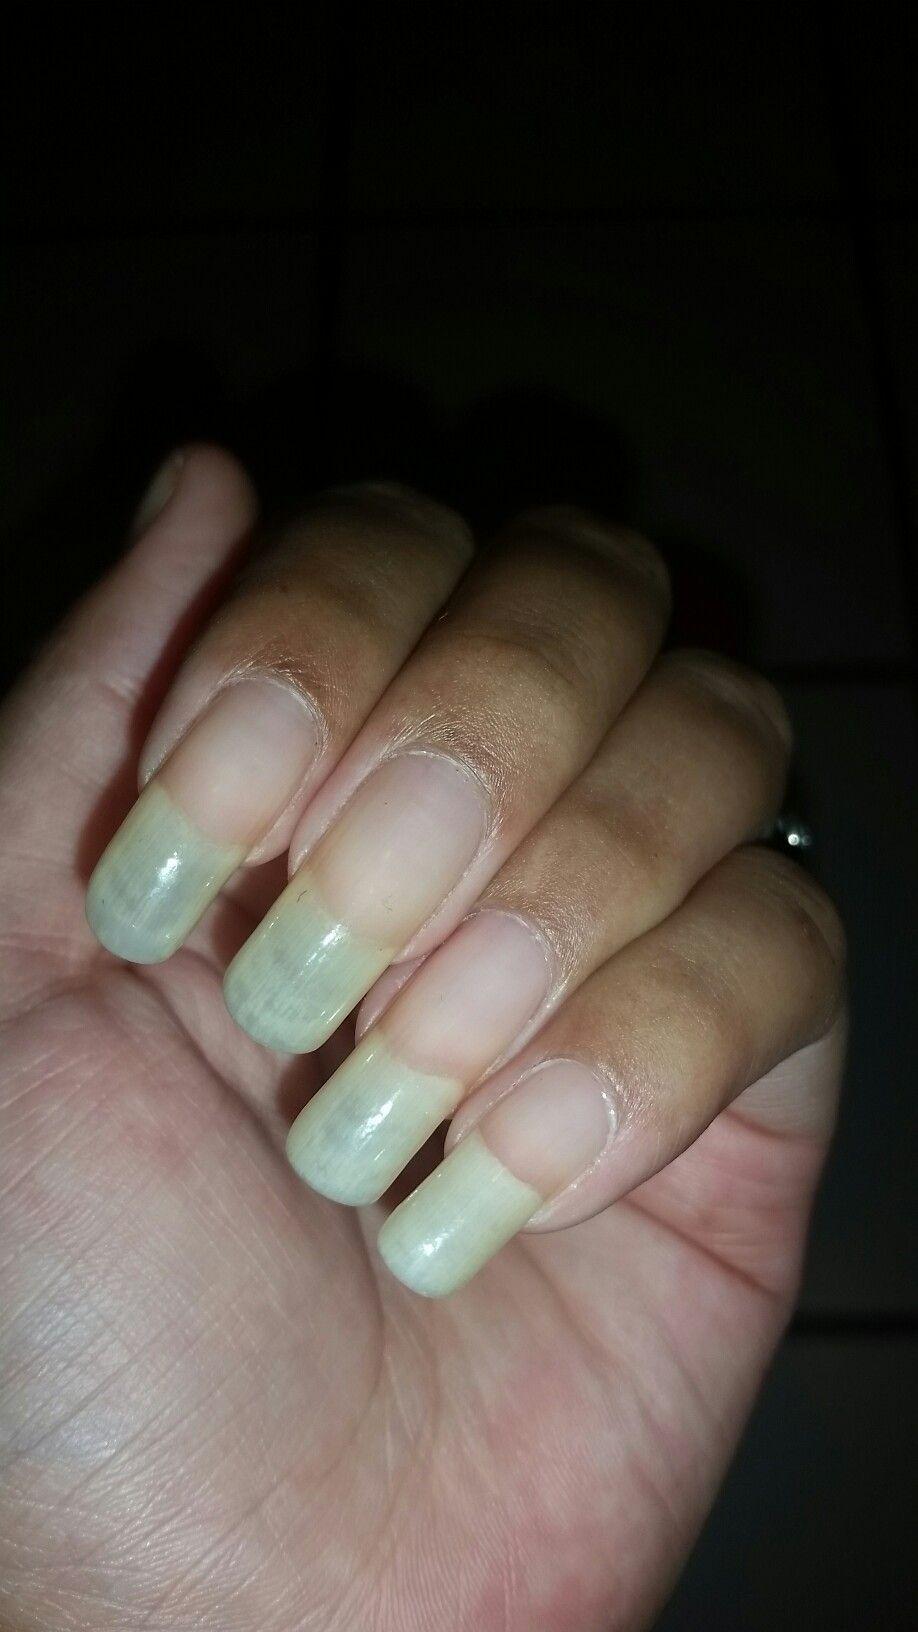 Pinterest Insta Morganvpierce Natural Nail Designs Bridal Nails Wedding Nails Design